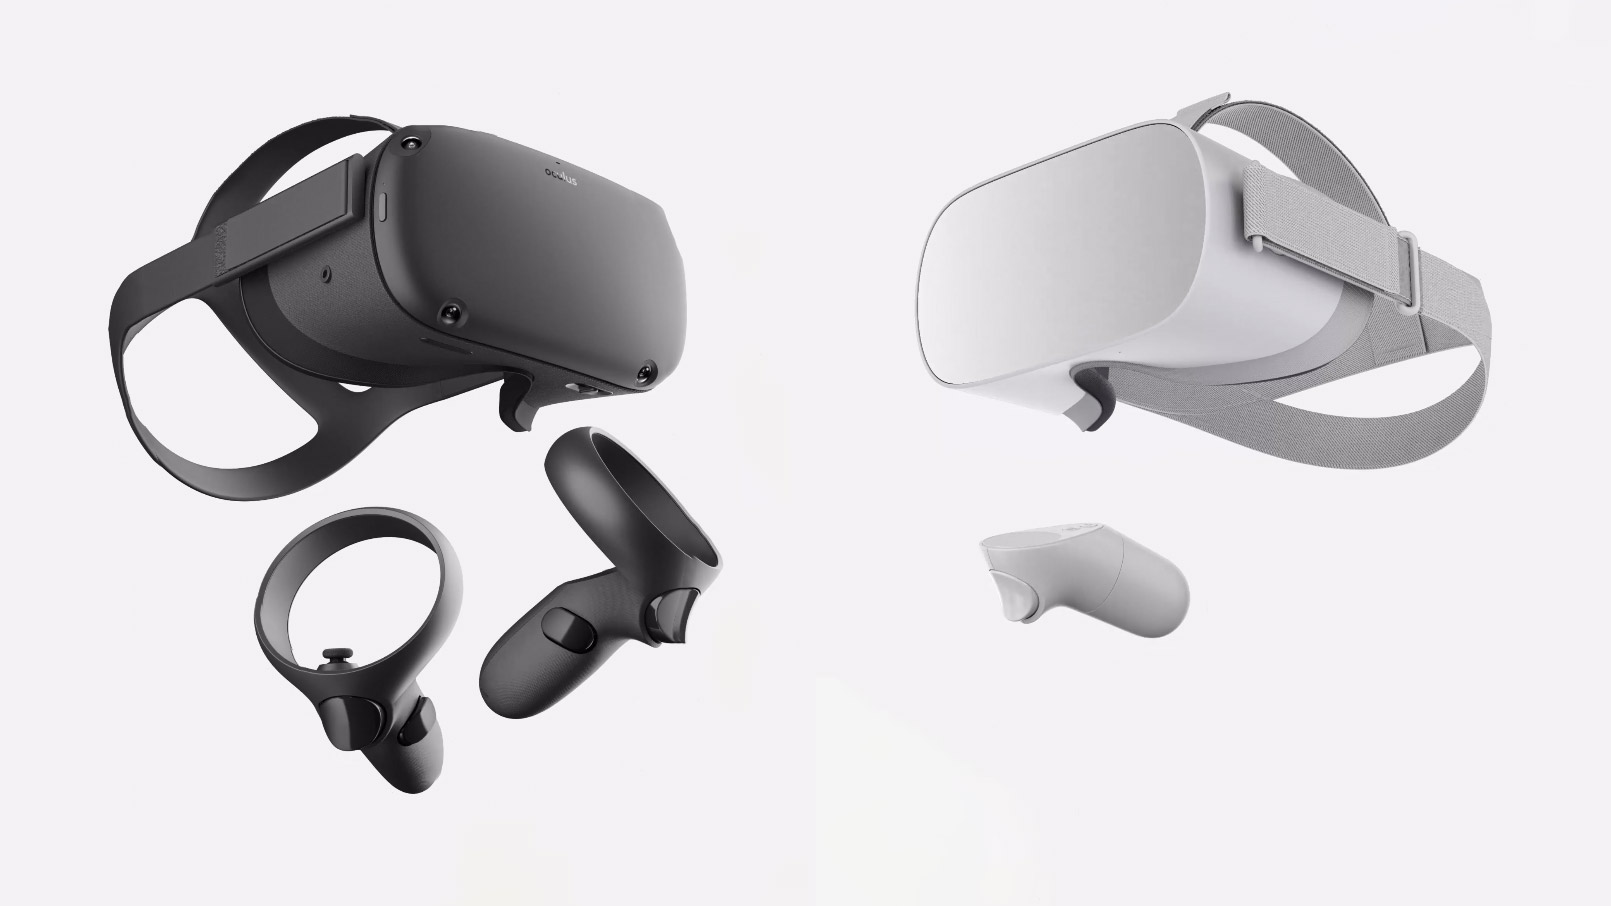 Quest 2将不支持Oculus Go的游戏及应用